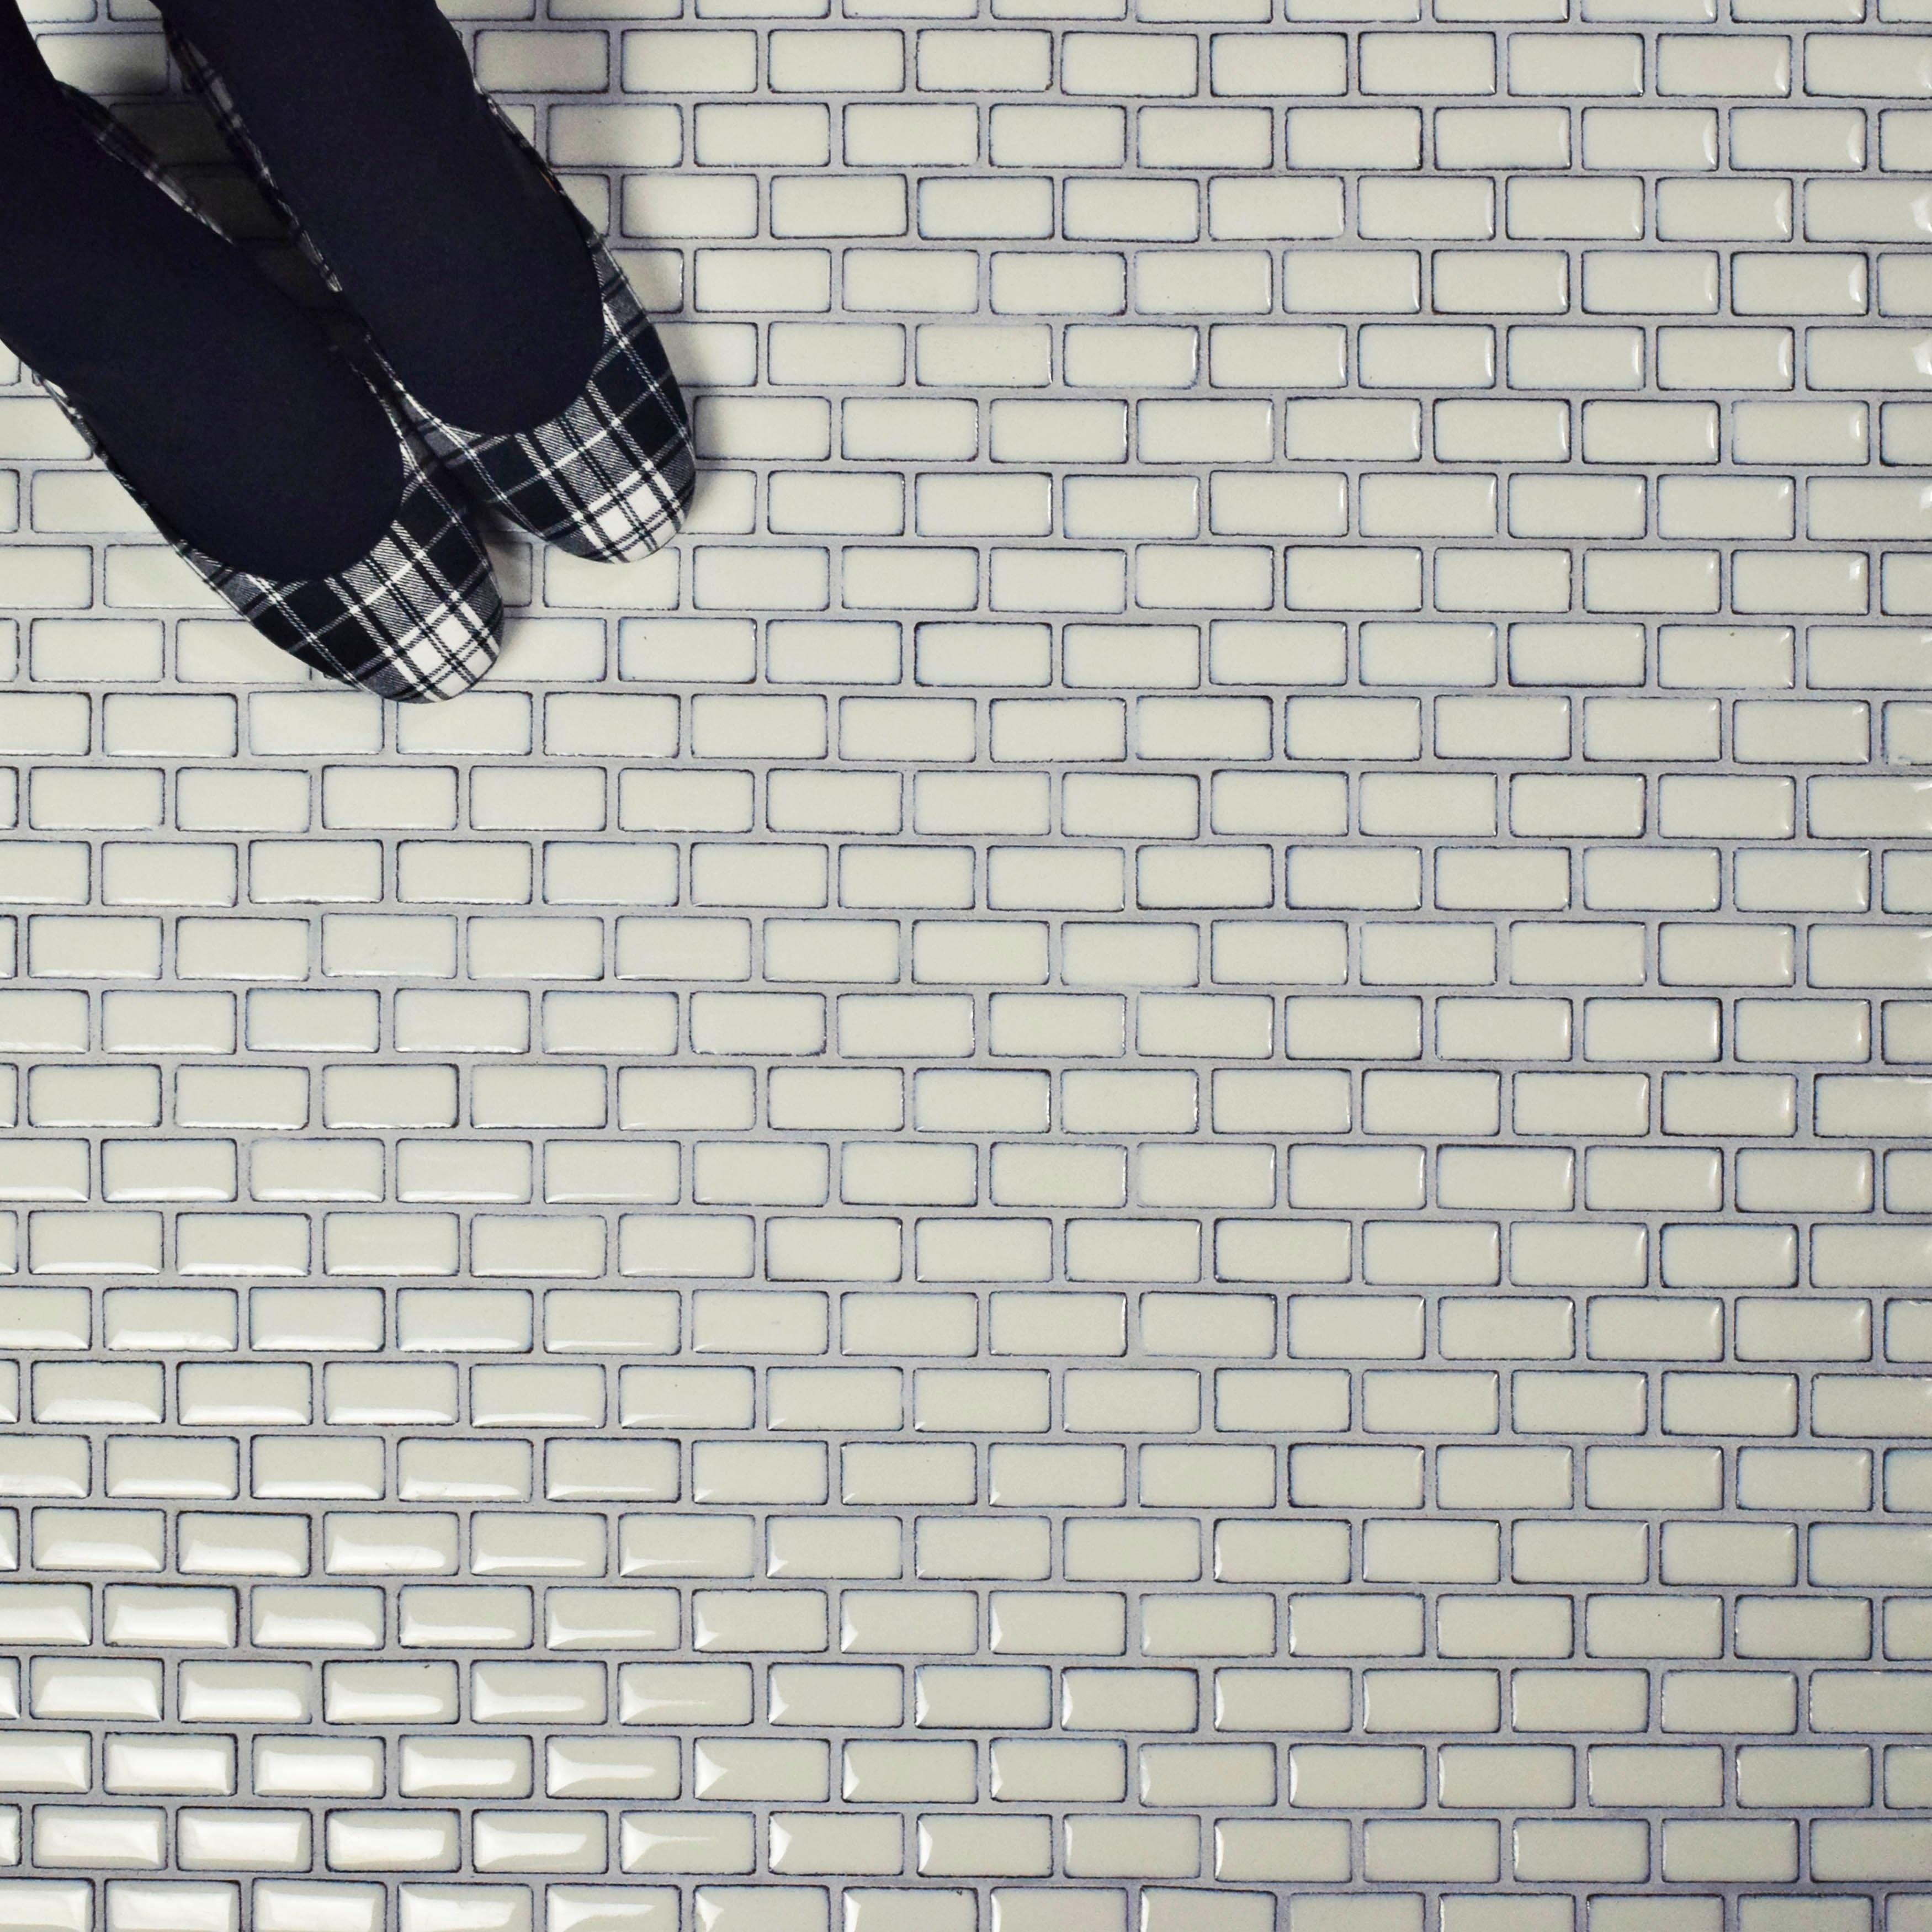 SomerTile 11.875x12-inch Aspect Subway Ivory White Porcelain Mosaic Floor and Wall Tile (10 tiles/9.8 sqft.) (SAMPLE-Aspect Subway)